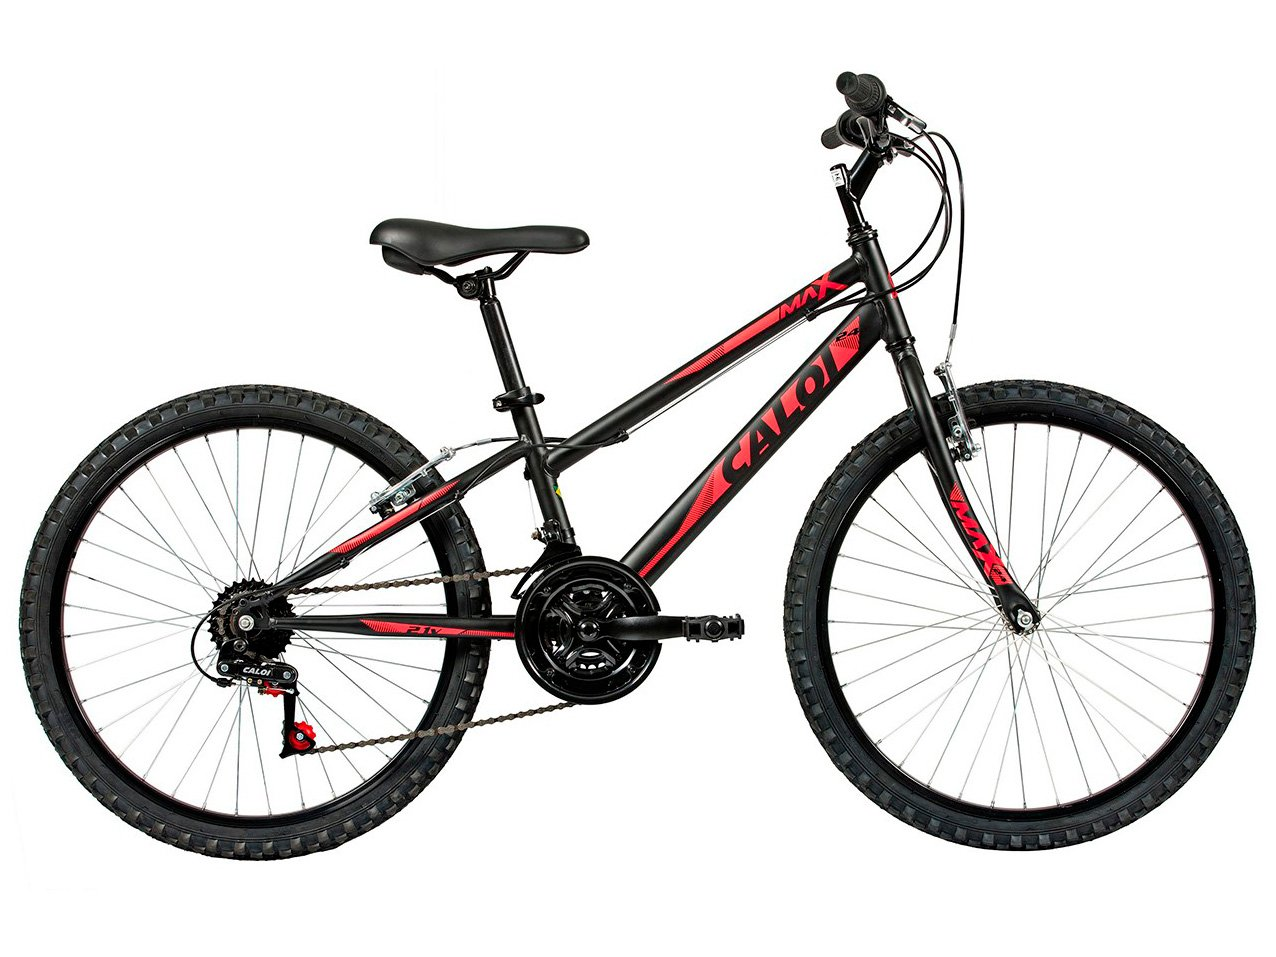 Bicicleta Aro 24 Caloi Max Juvenil - Tam: 12